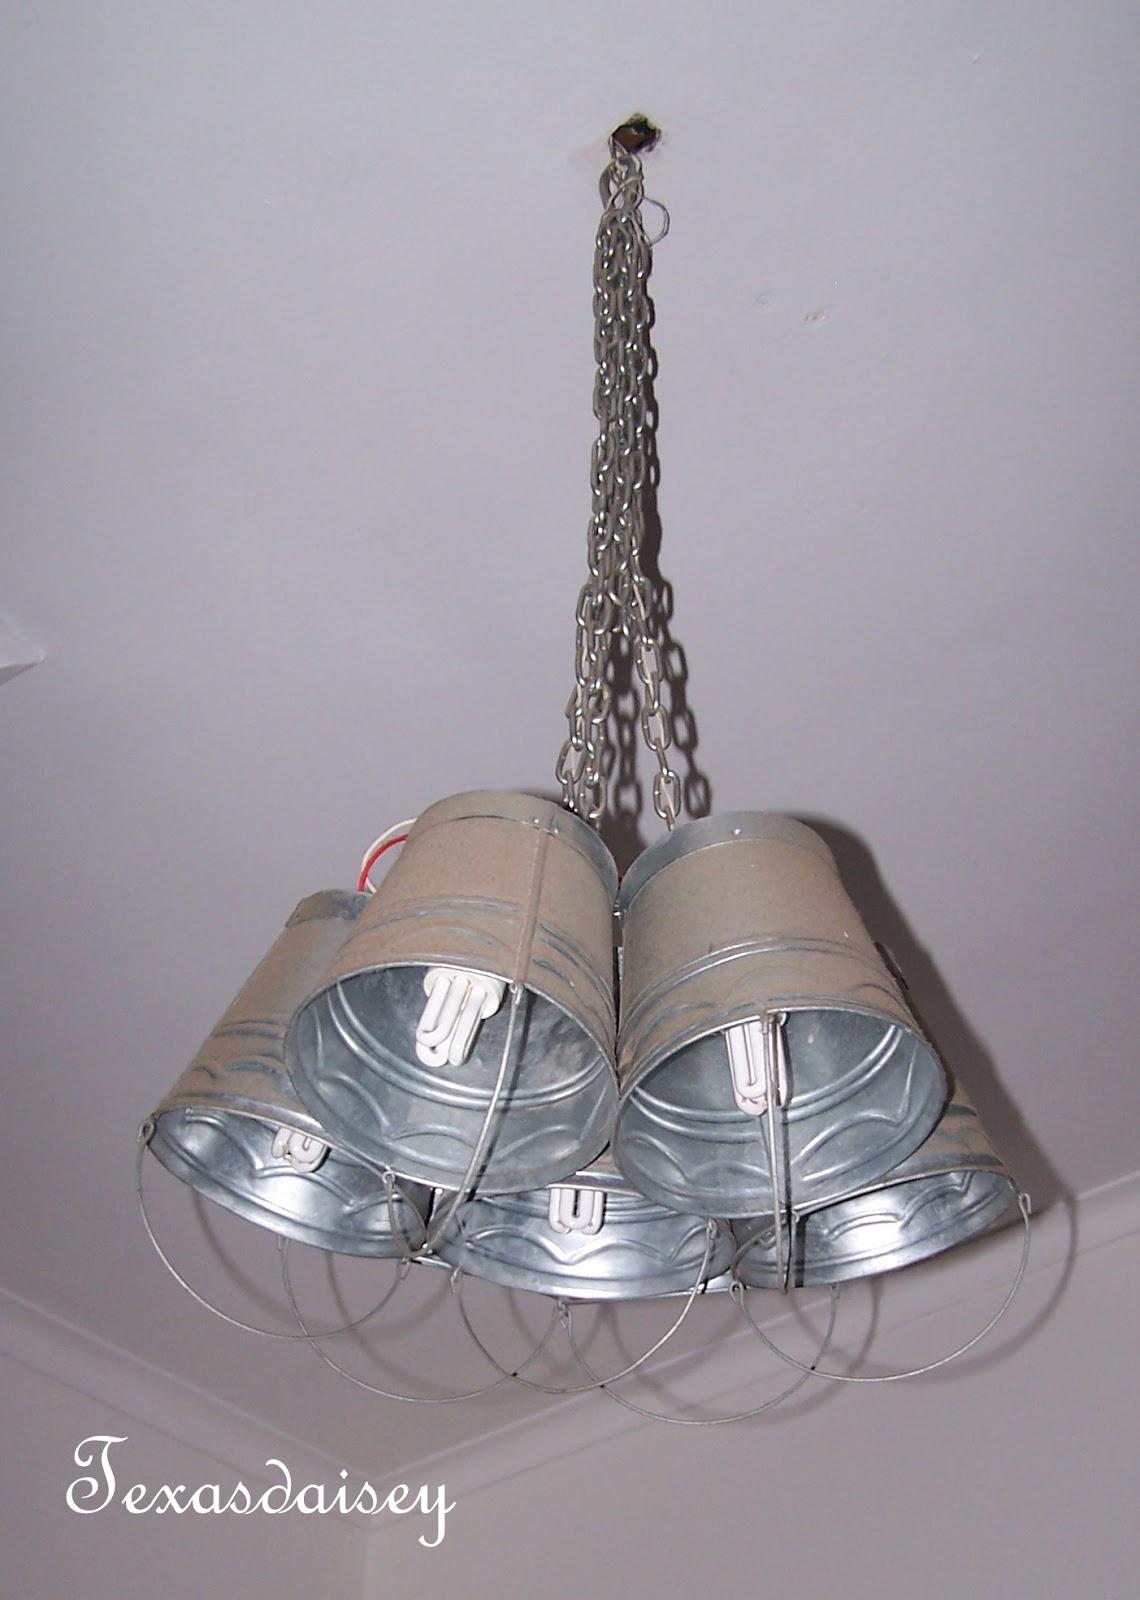 Texasdaisey creations galvanized light fixture galvanized light fixture arubaitofo Choice Image